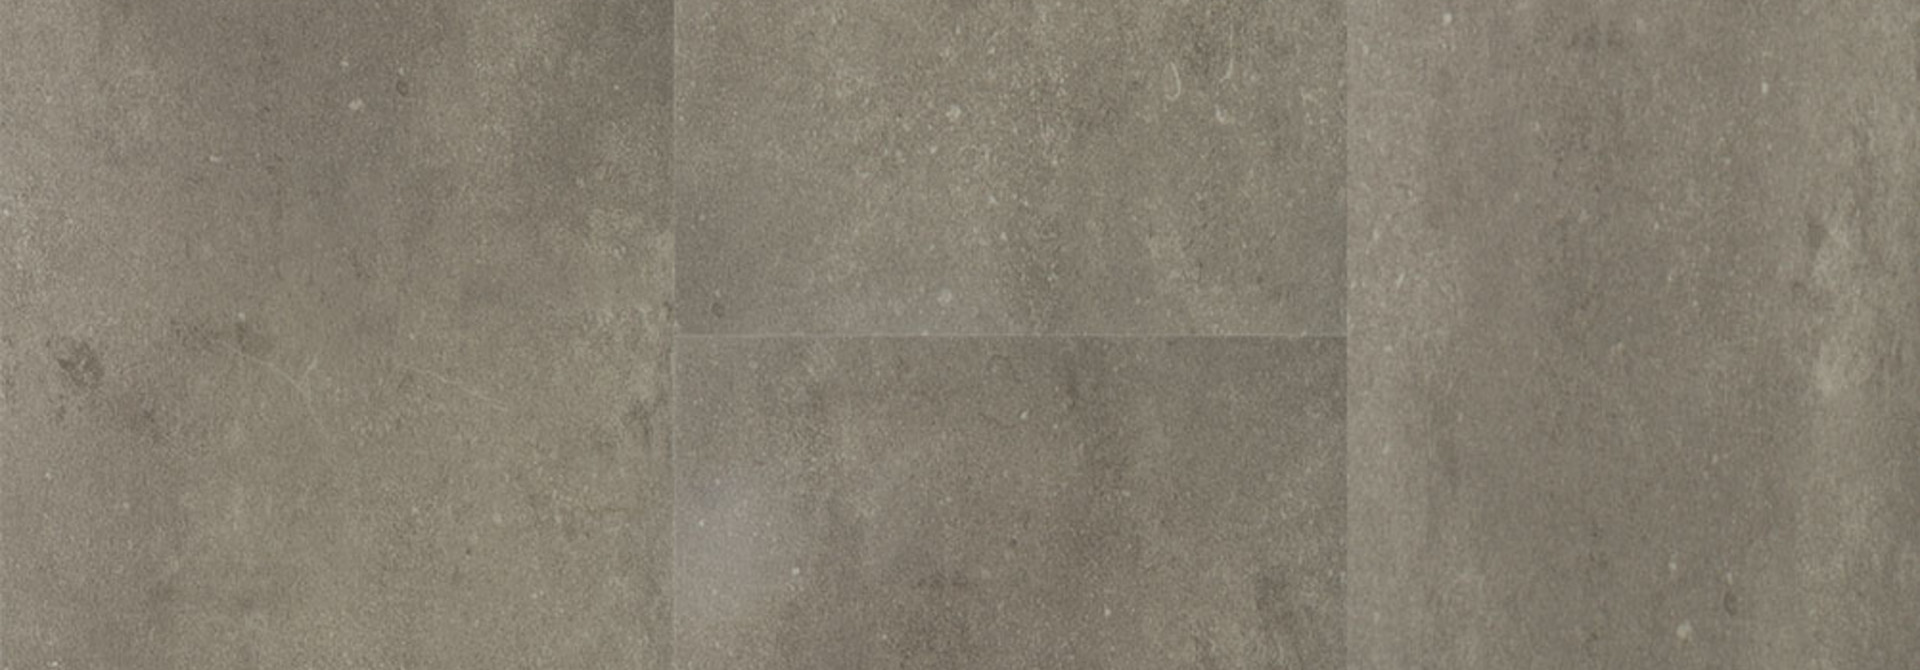 Beton Design PVC 91x91cm